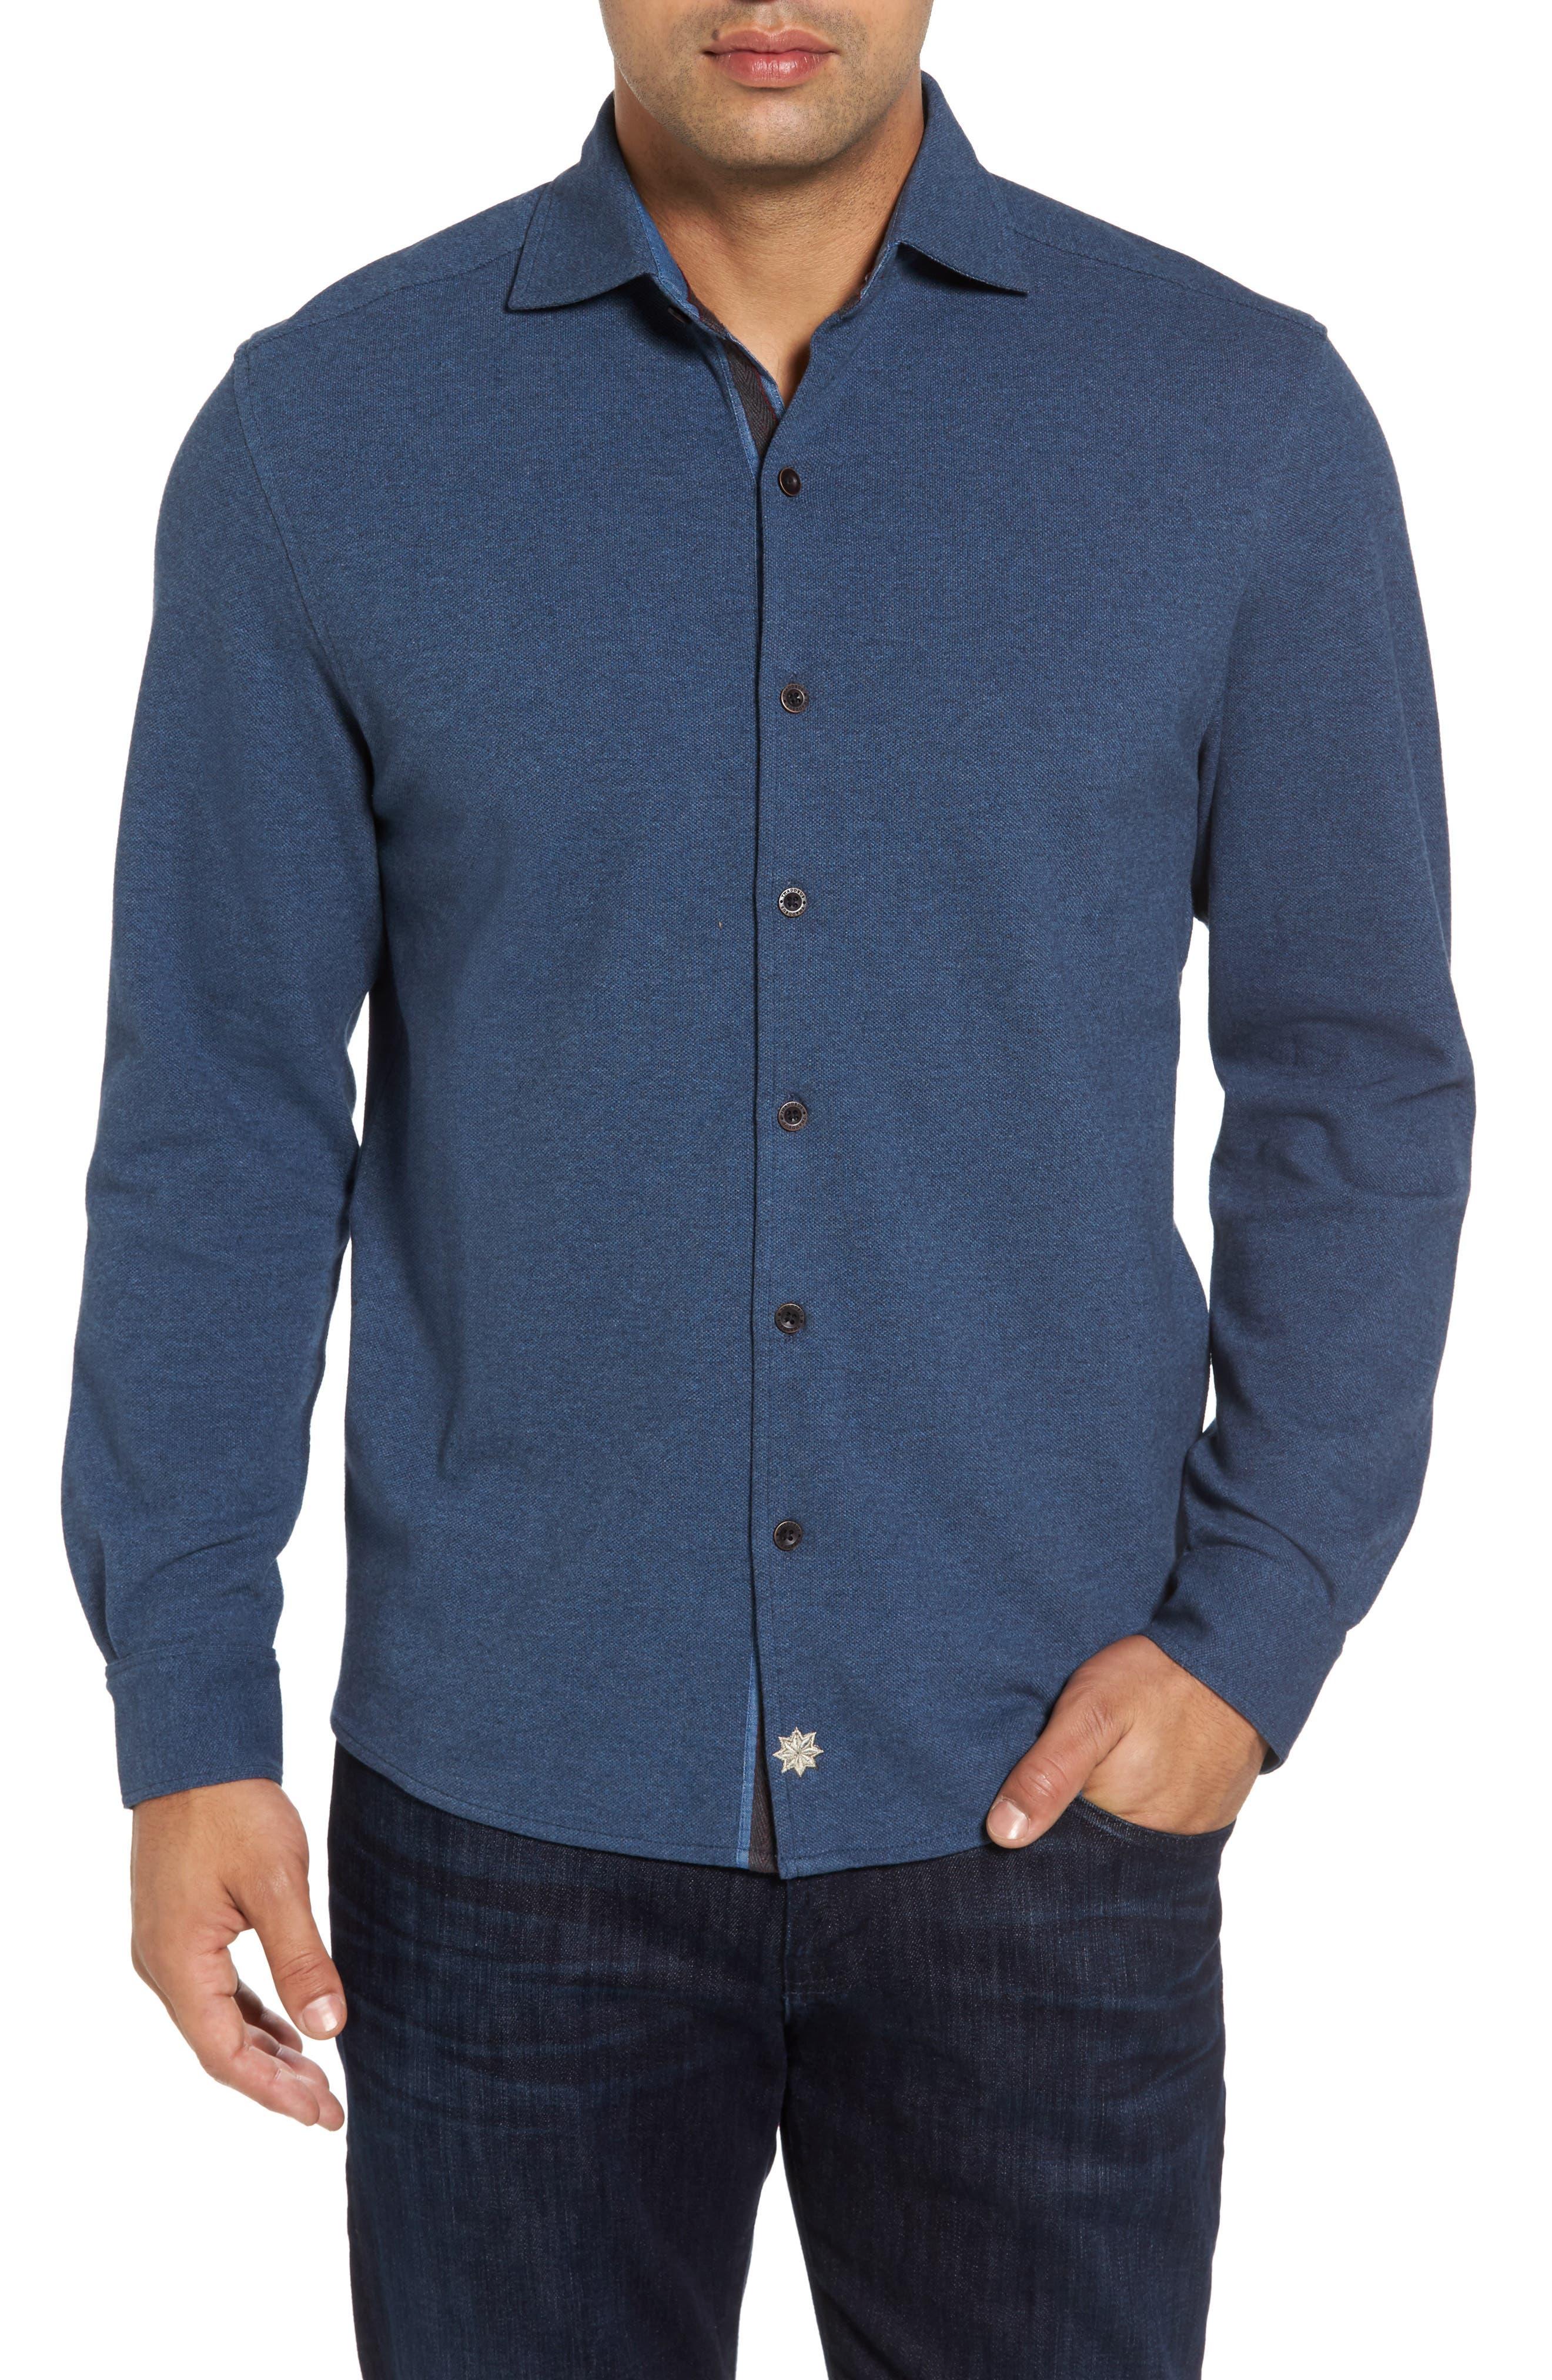 Shandy Heathered Knit Sport Shirt,                             Main thumbnail 2, color,